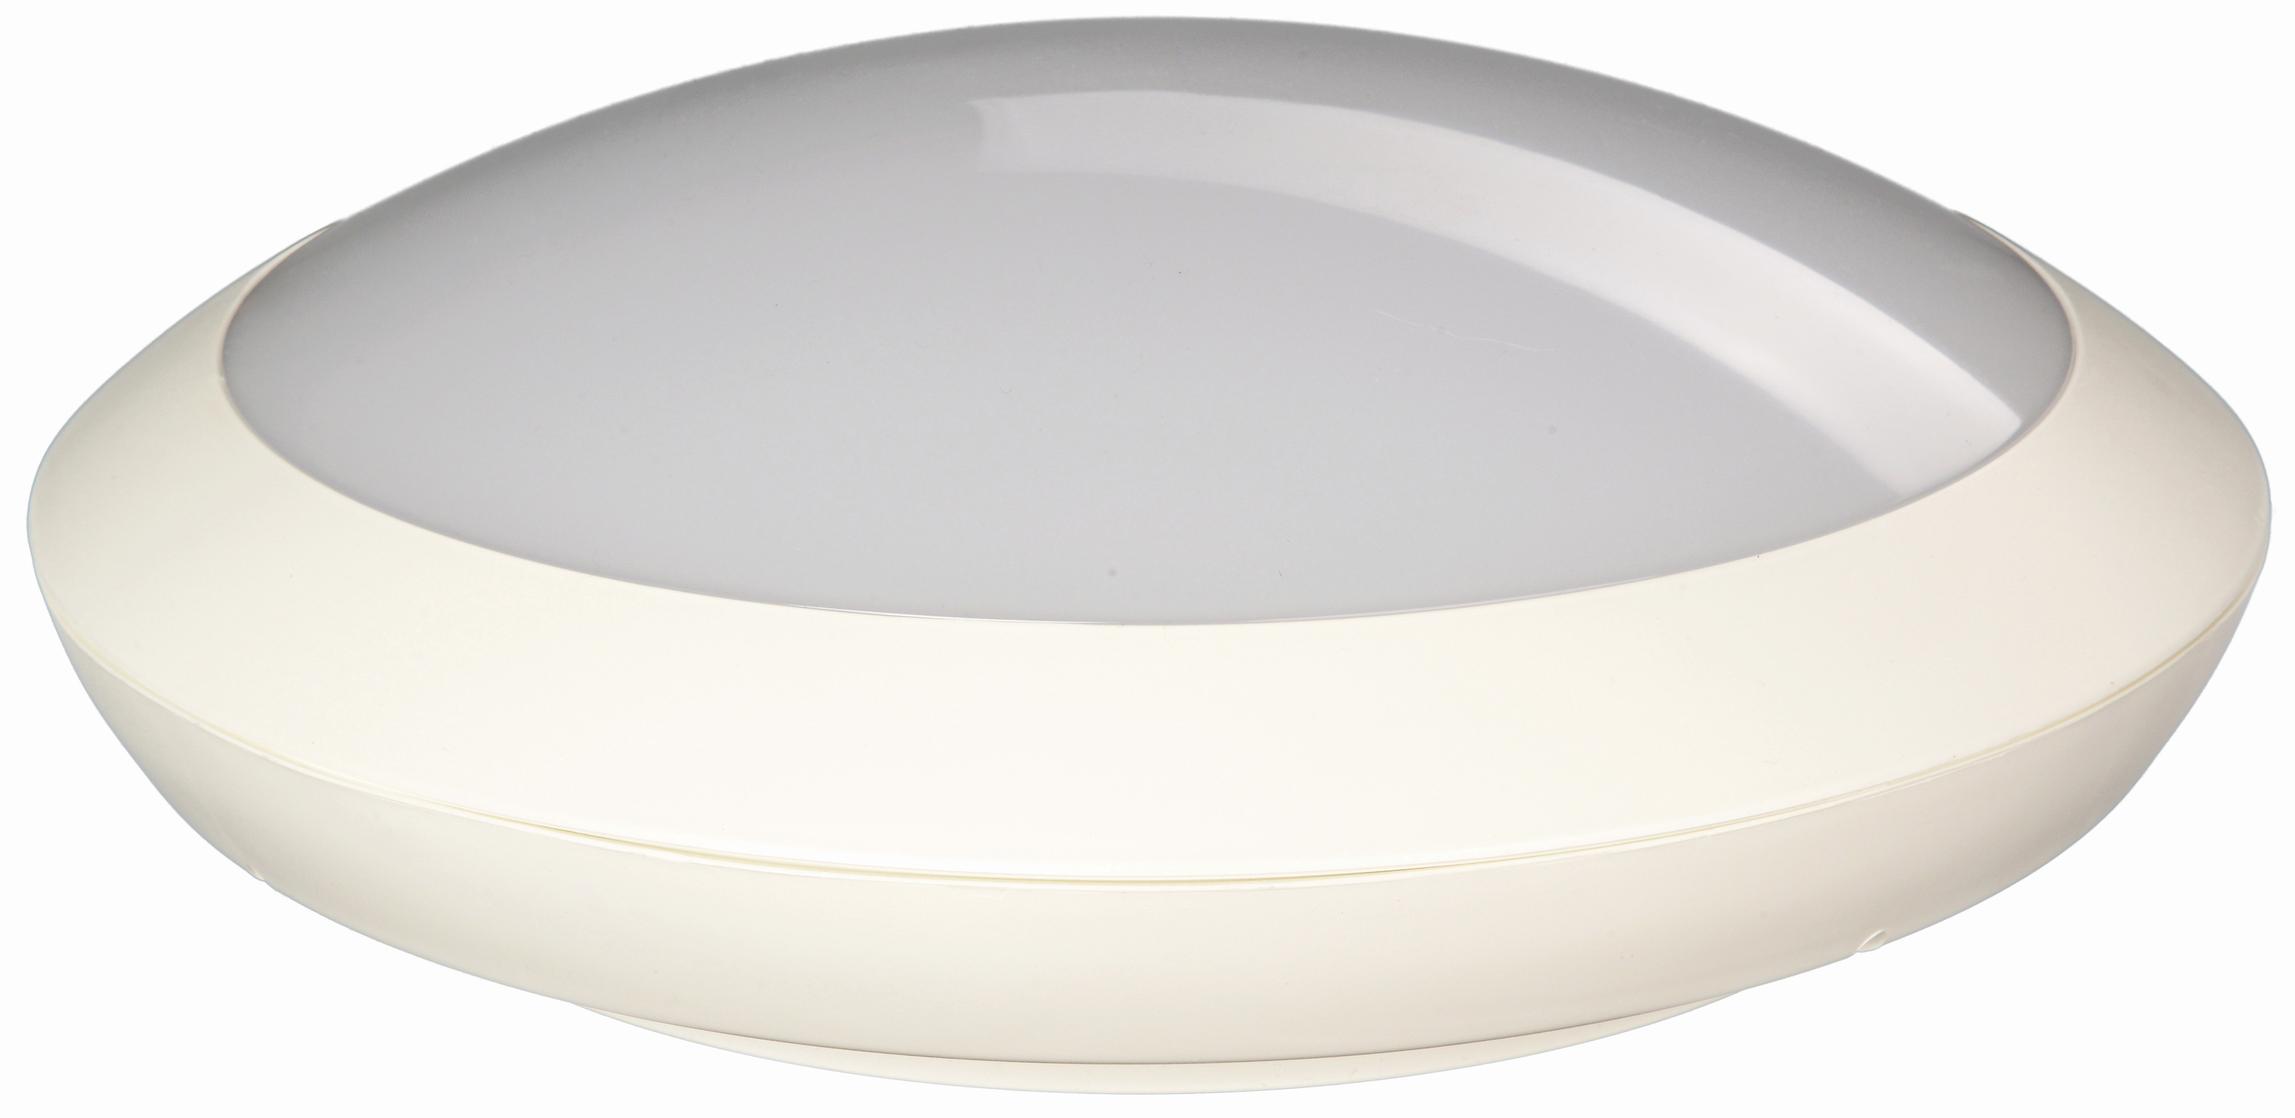 LED Decken- / Wandleuchte IP66